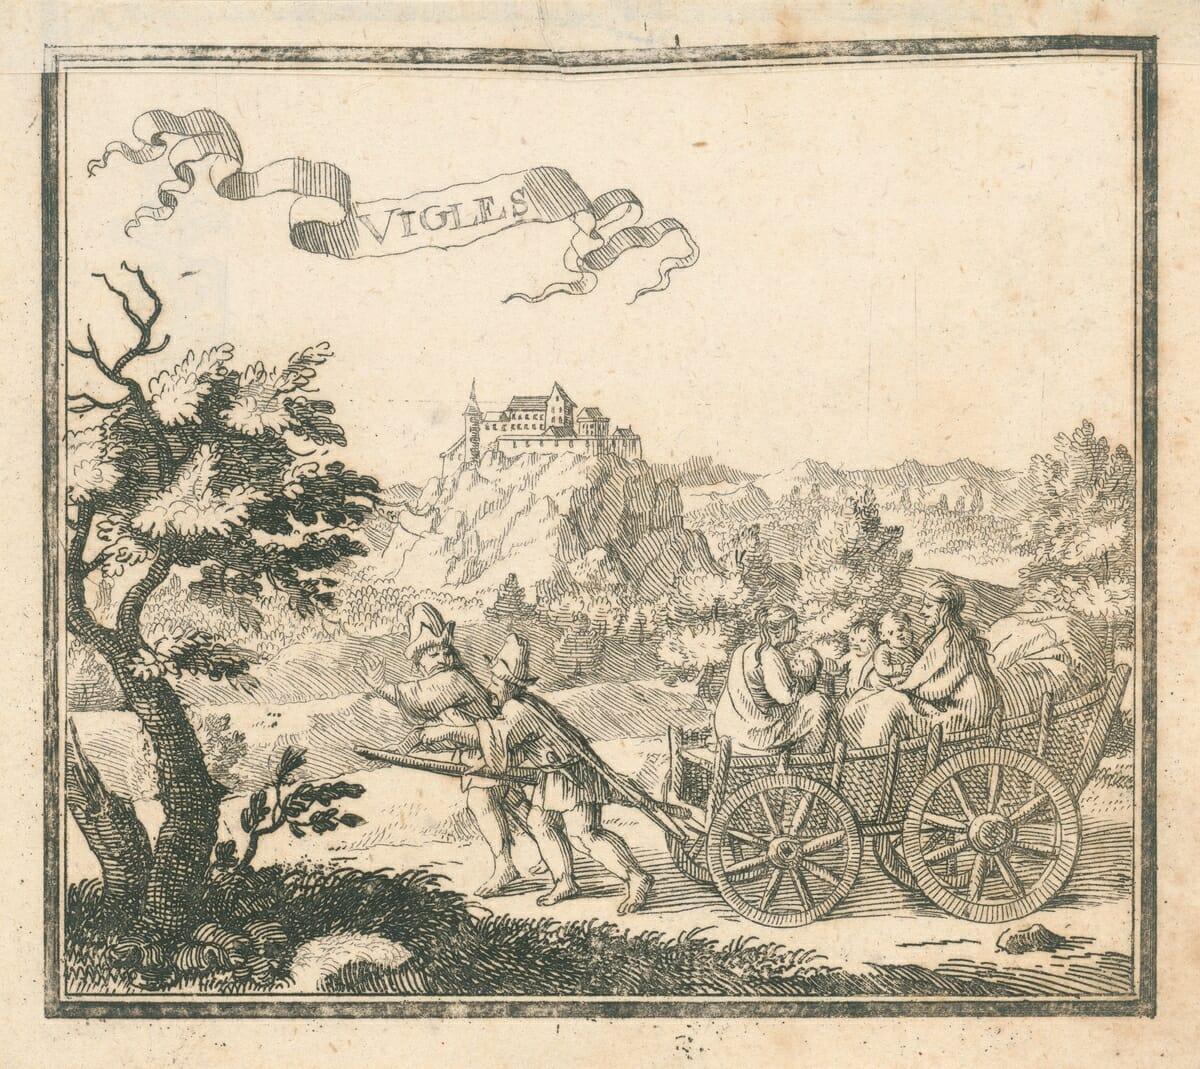 Vígľaš, Justus van den Nypoort, 1686, OGD